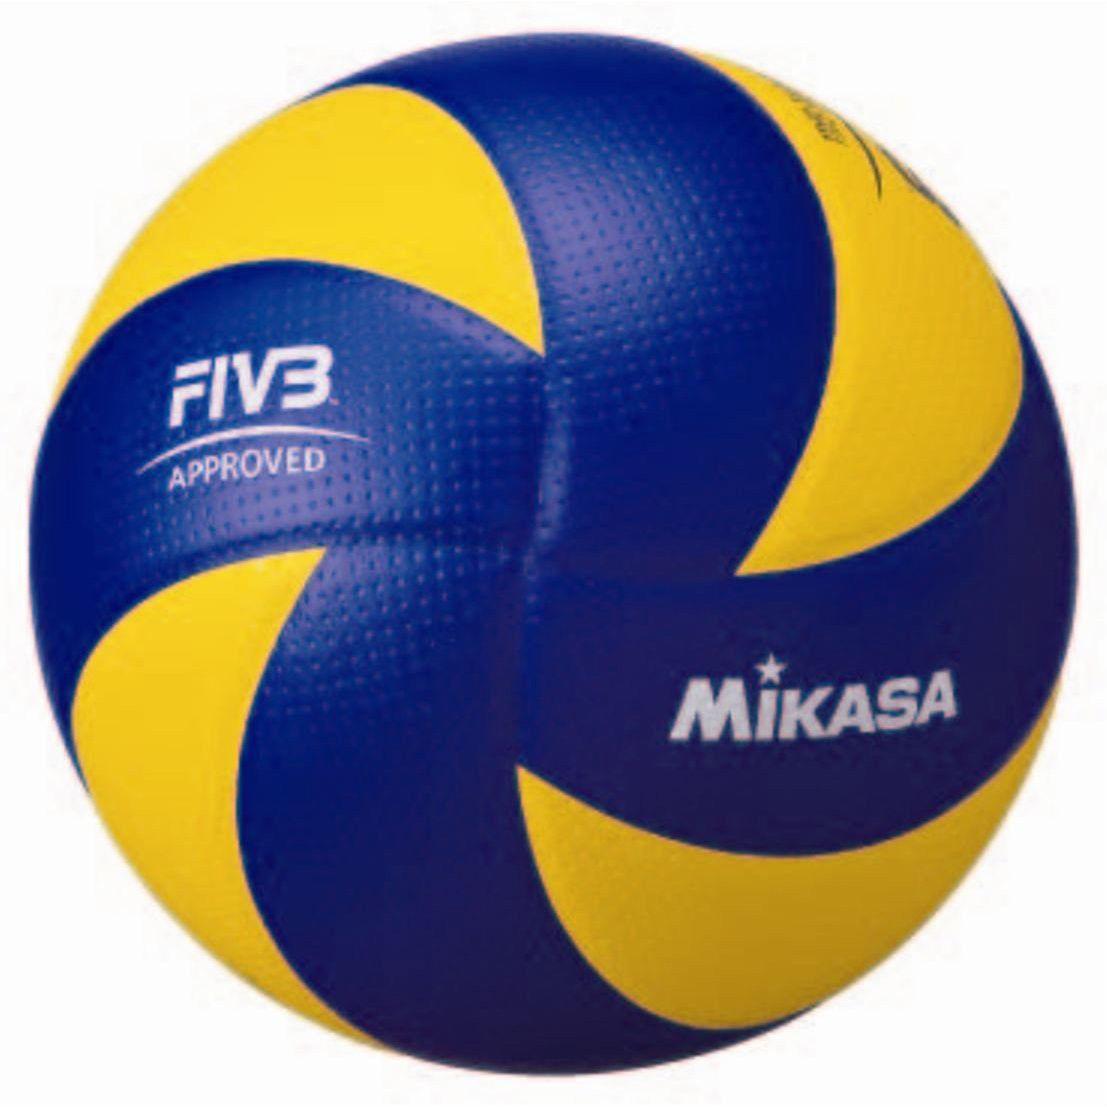 Mikasa FIVB Volleyball Official 2016 Olympic Game Ball ...  Mikasa FIVB Vol...